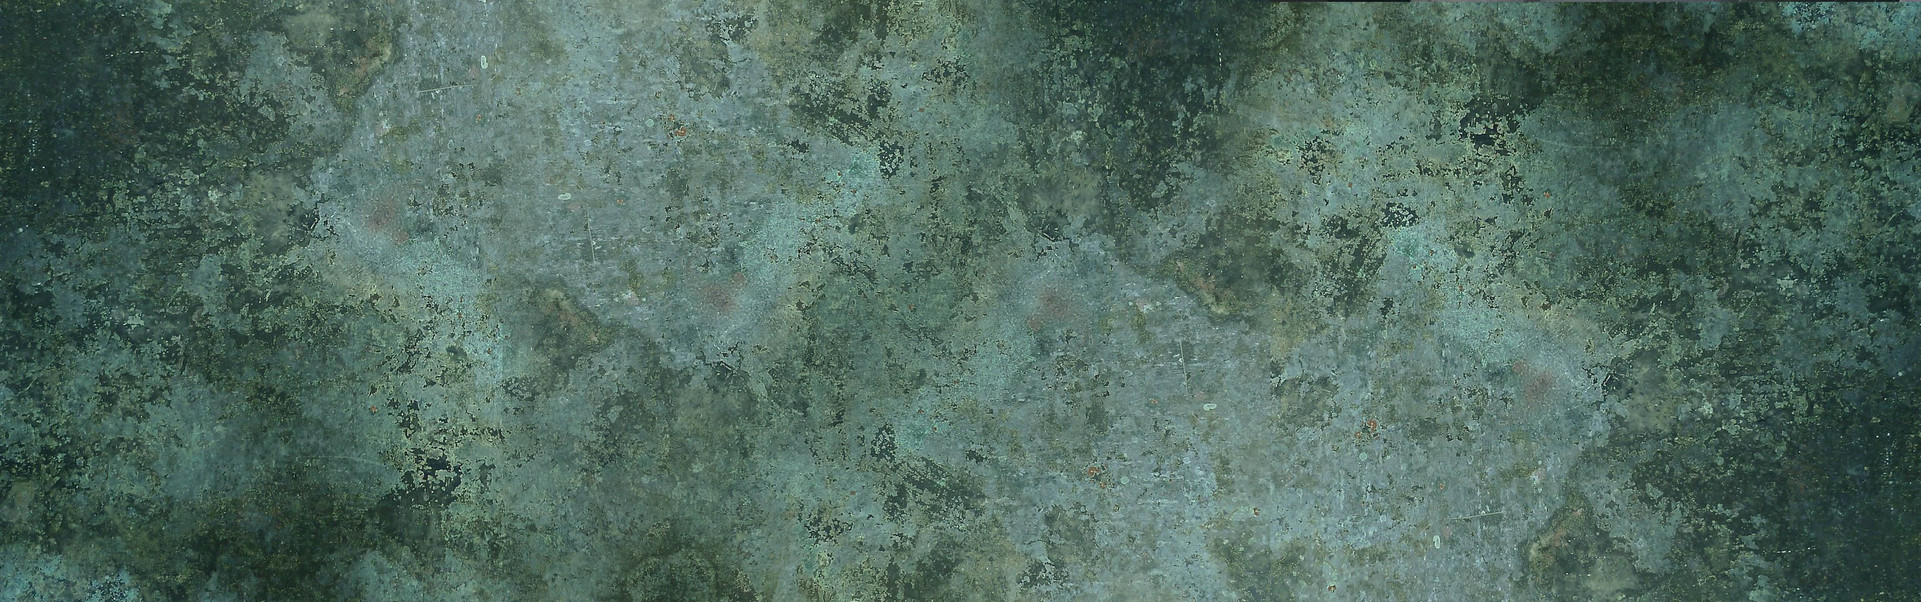 mt texture 1.jpg